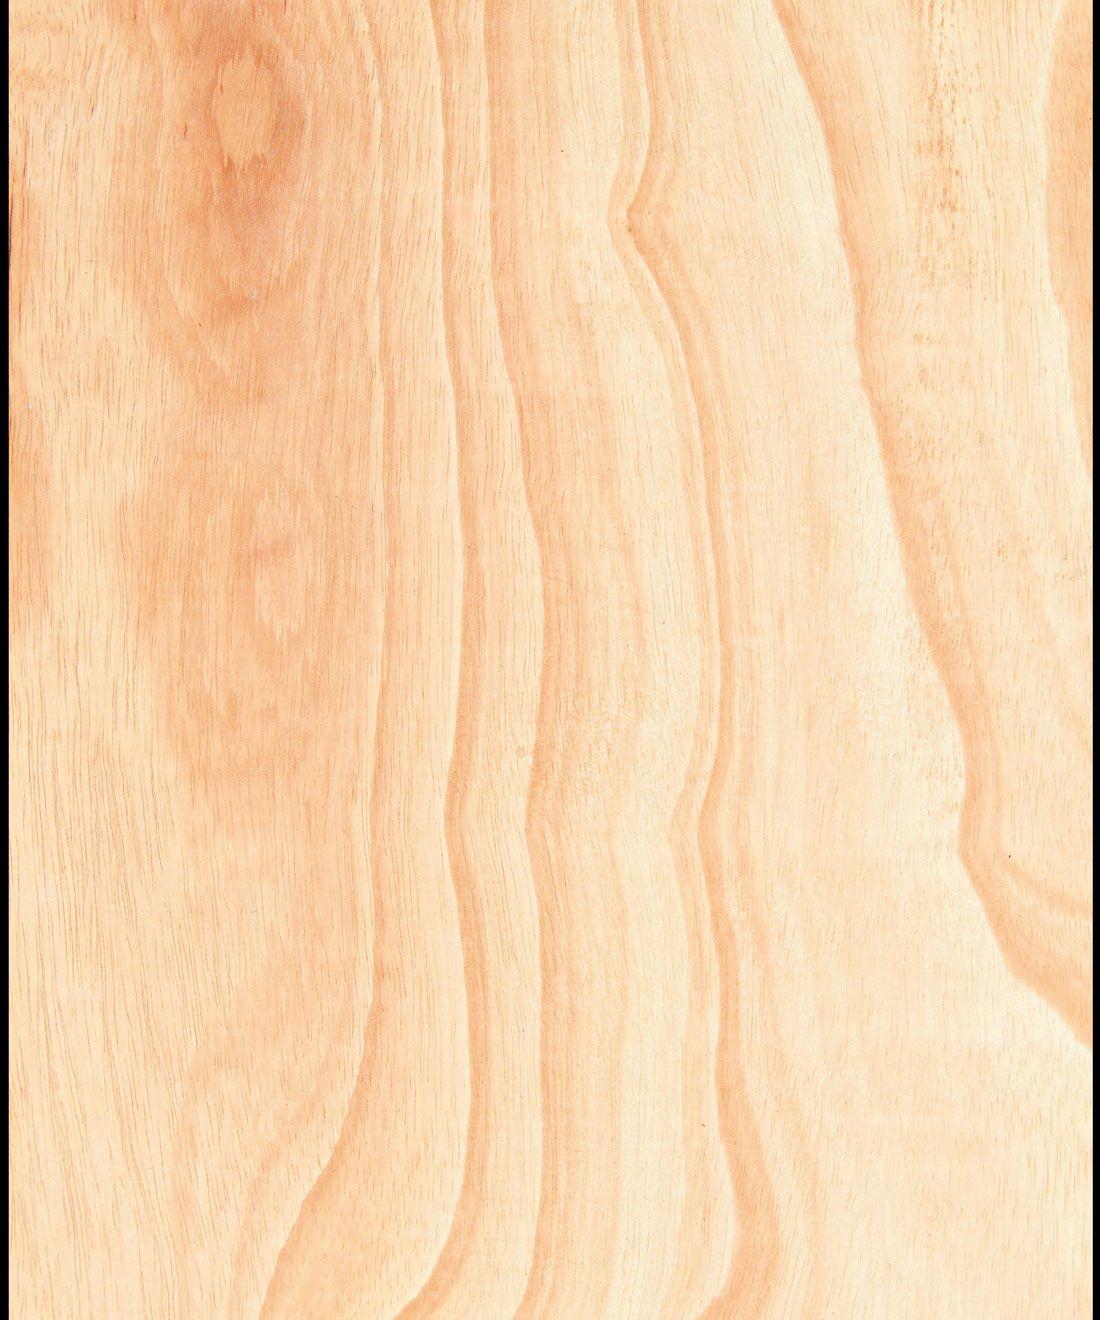 Ply Wood Wallpaper